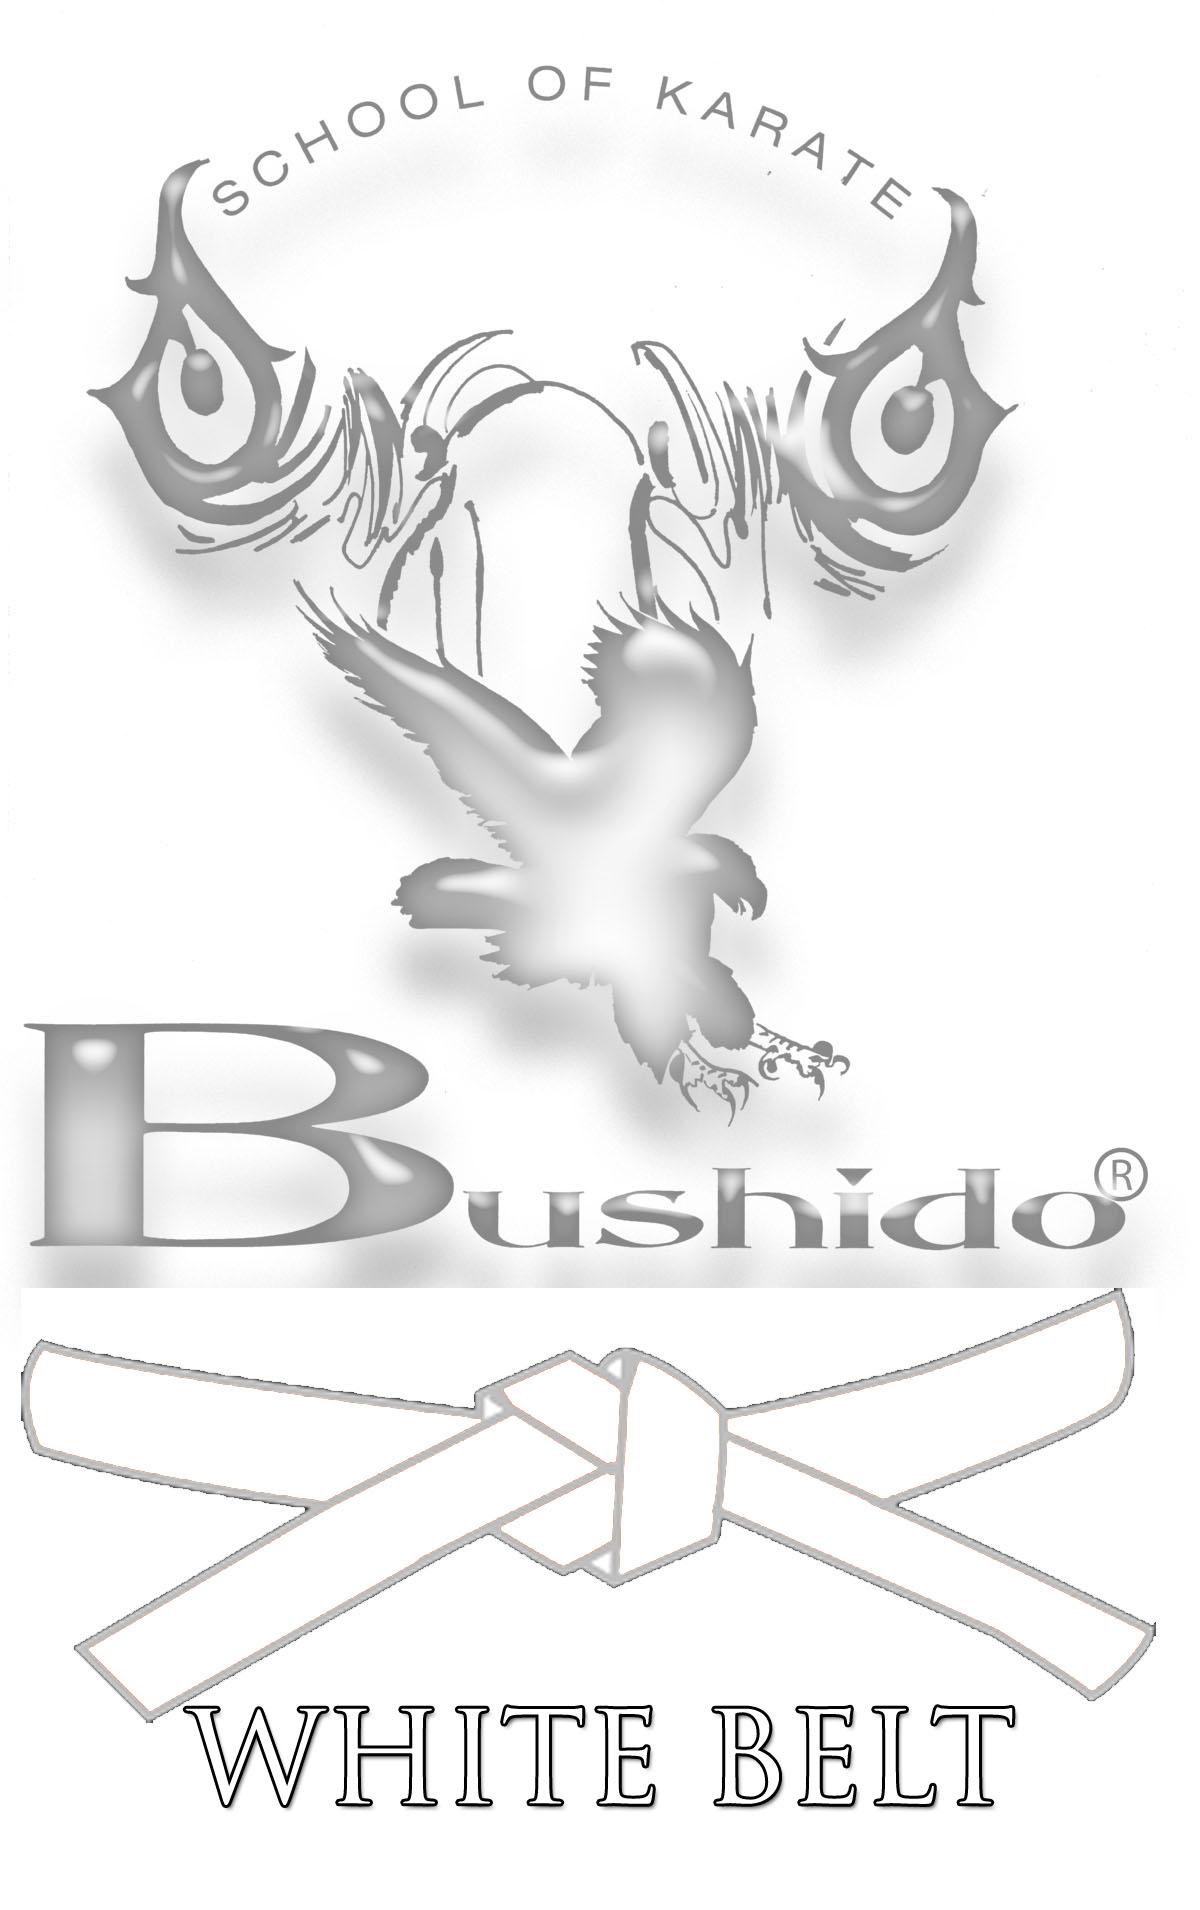 3c8e34e7962d4 Online Karate Lessons ⋆ THE BUSHIDO SCHOOL OF KARATE